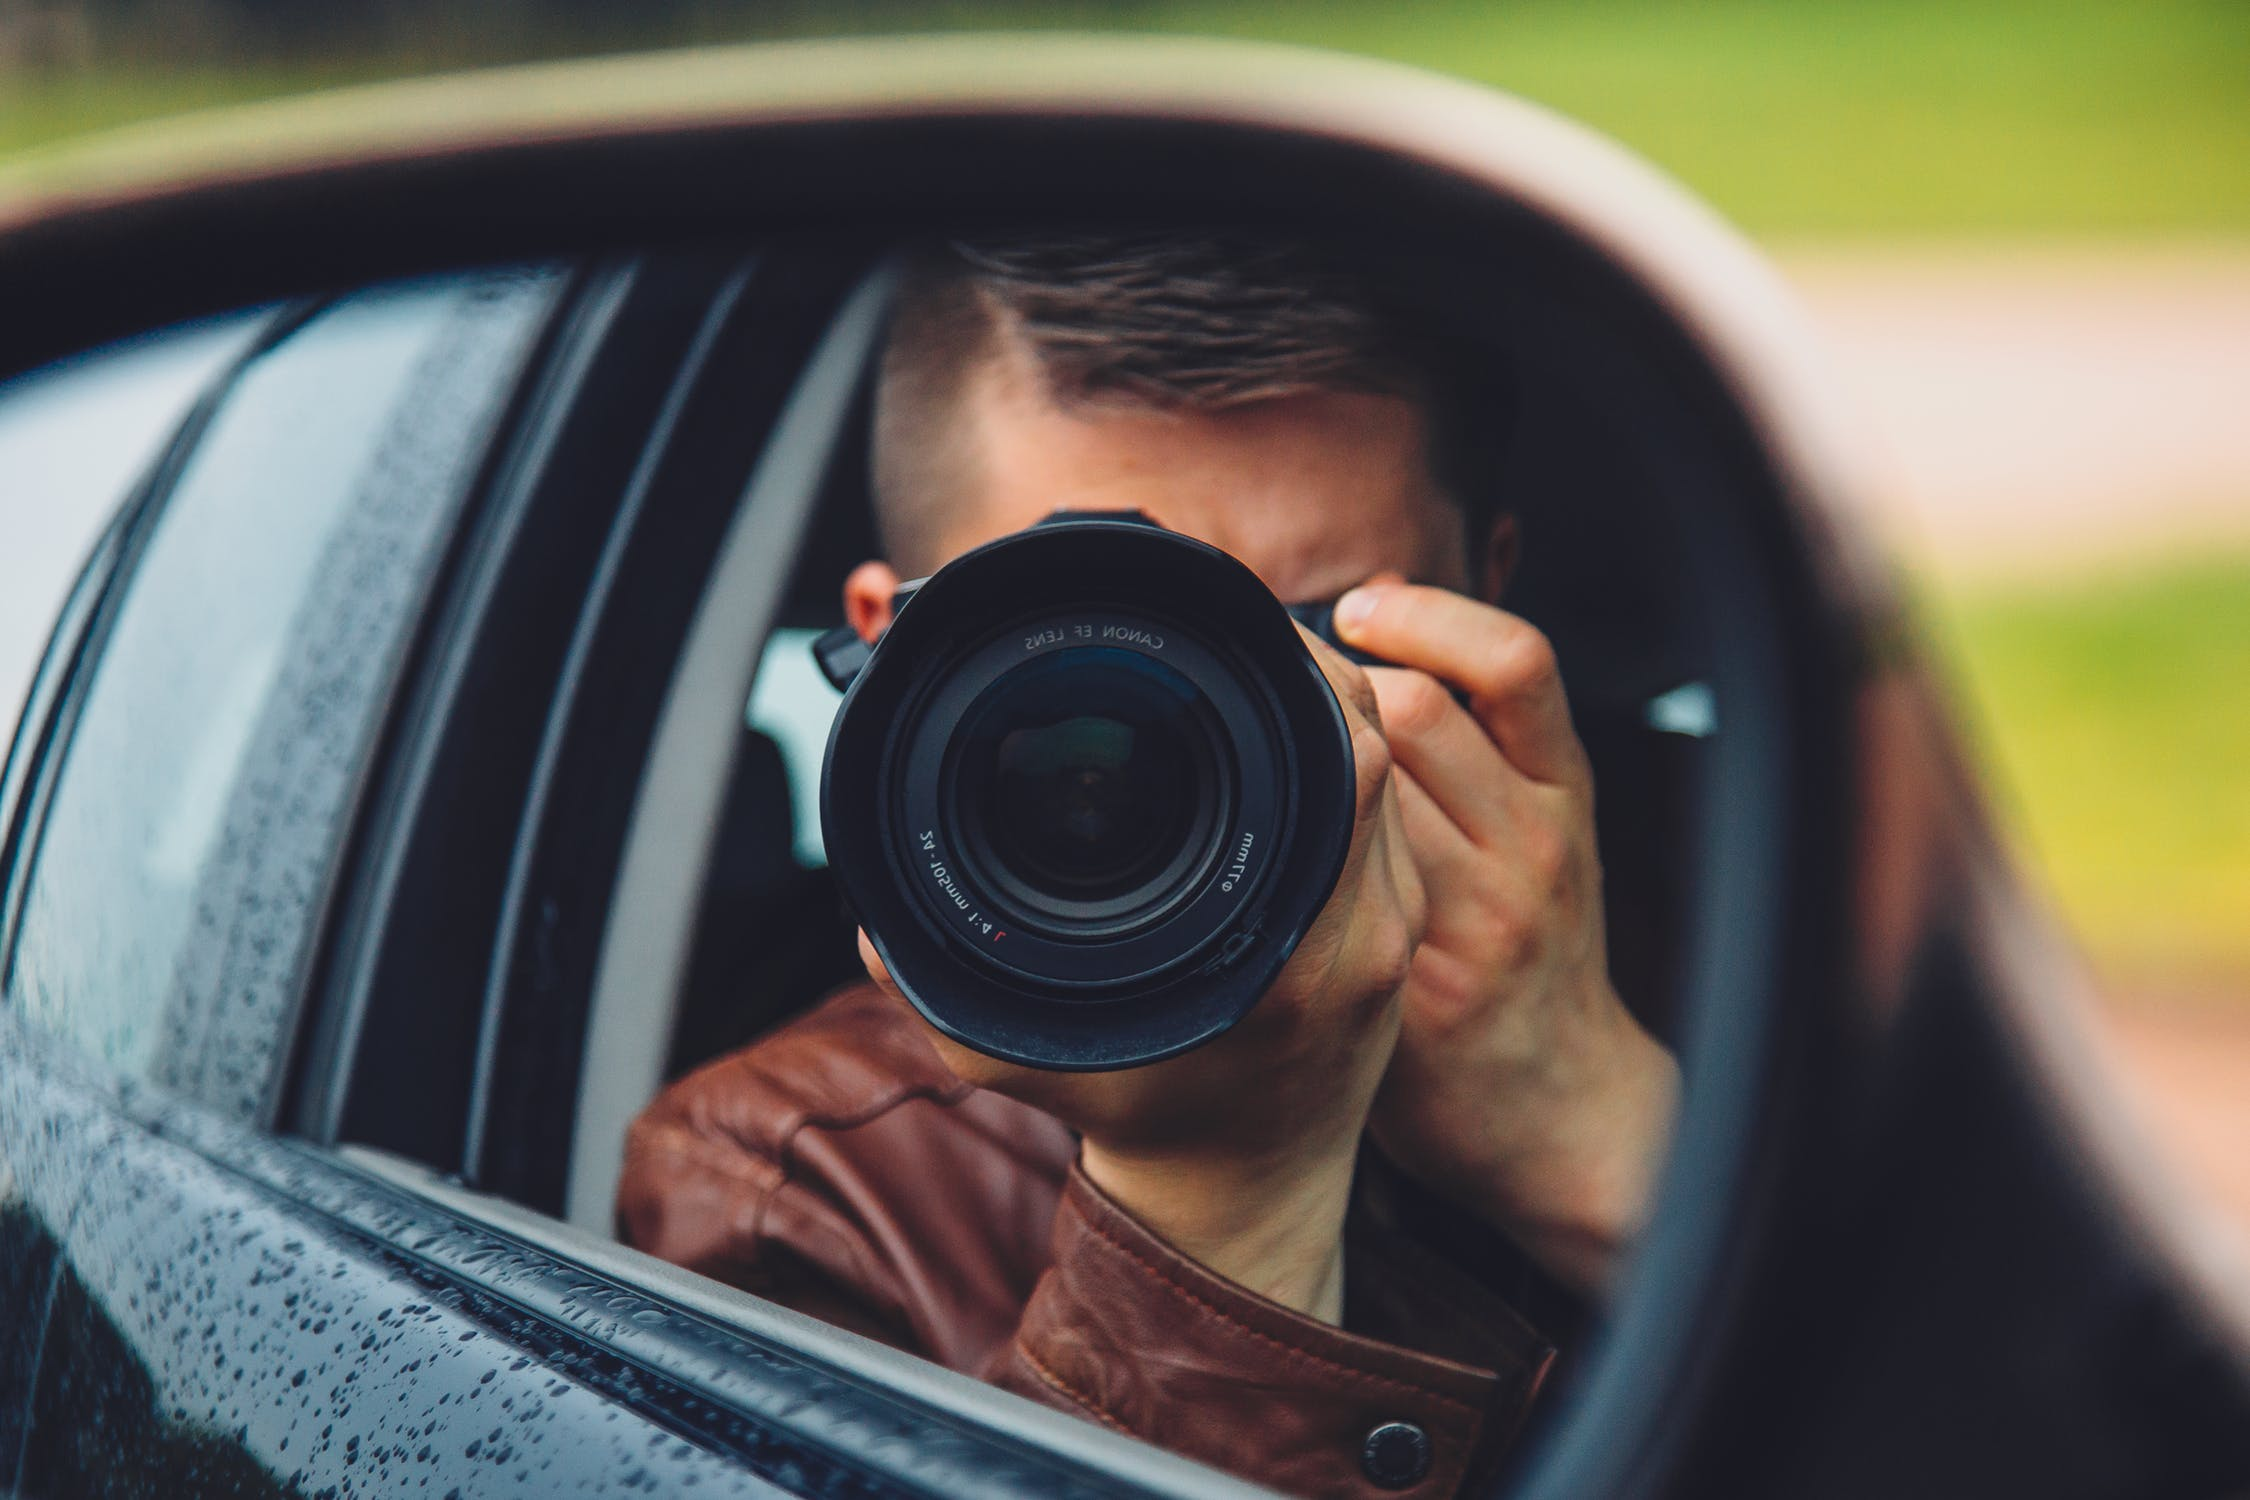 man-hand-camera-car-9637